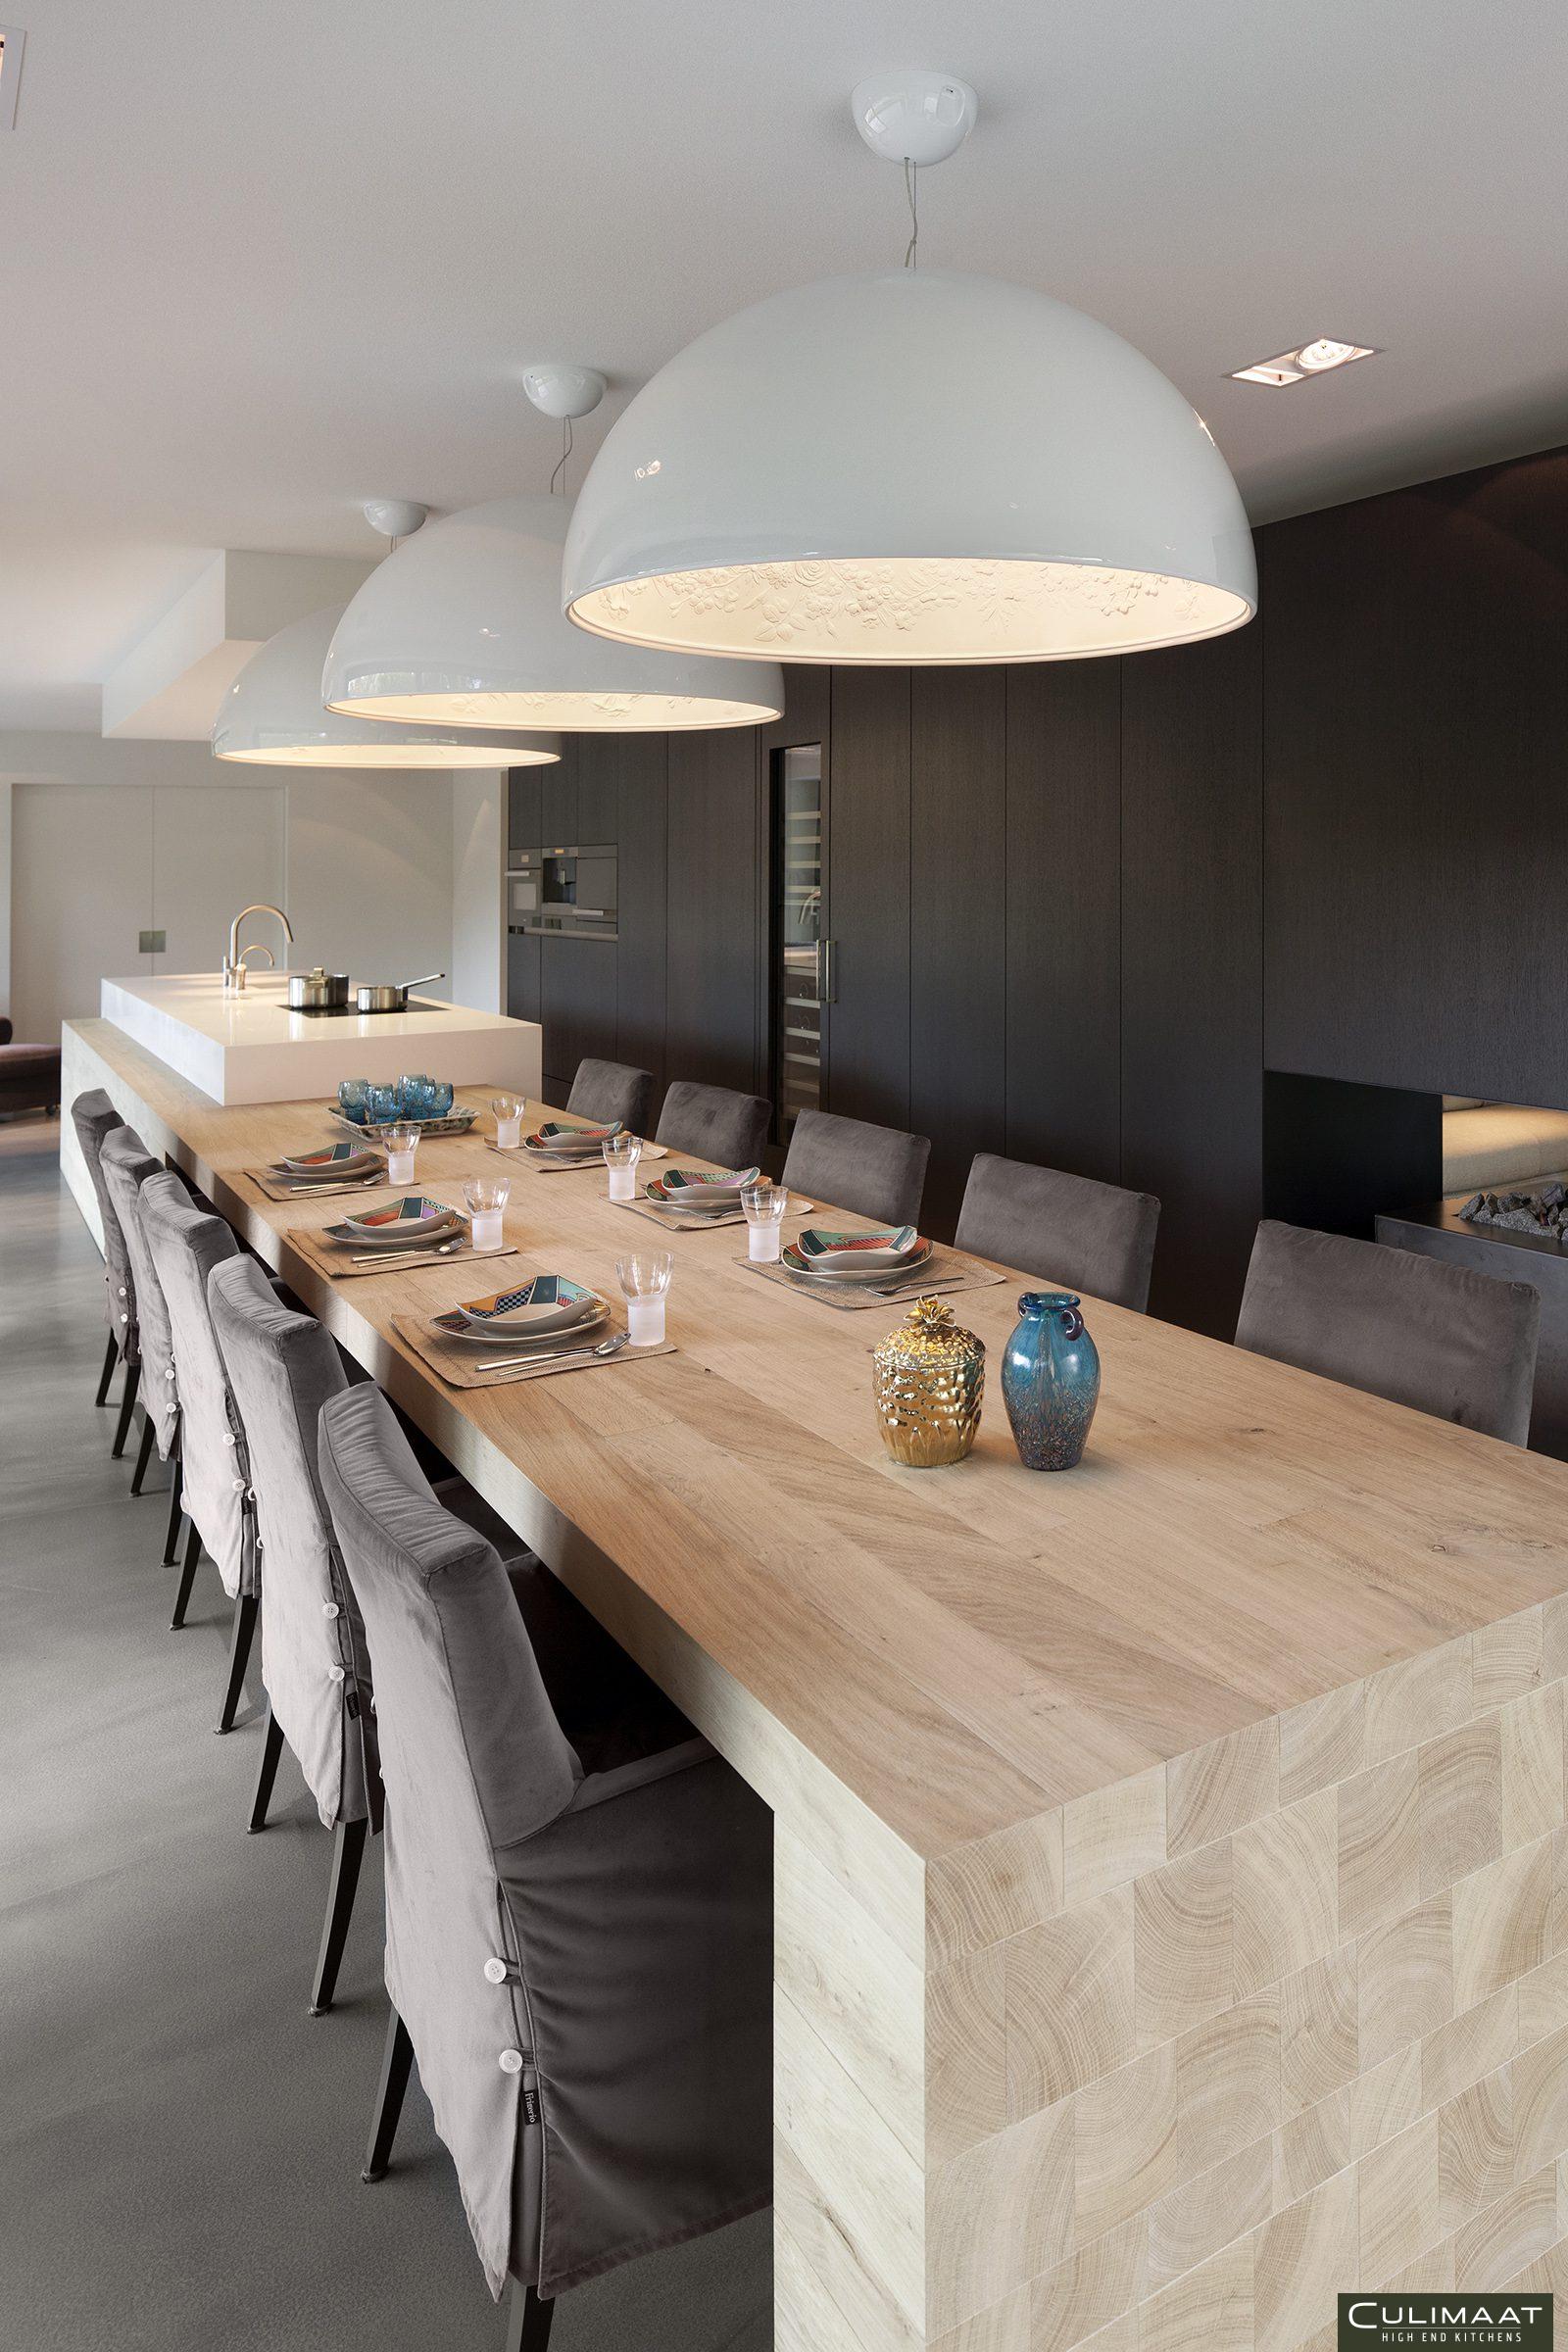 Houten keuken, Culimaat, Uniek design, moderne leefkeuken, stijlvolle keuken